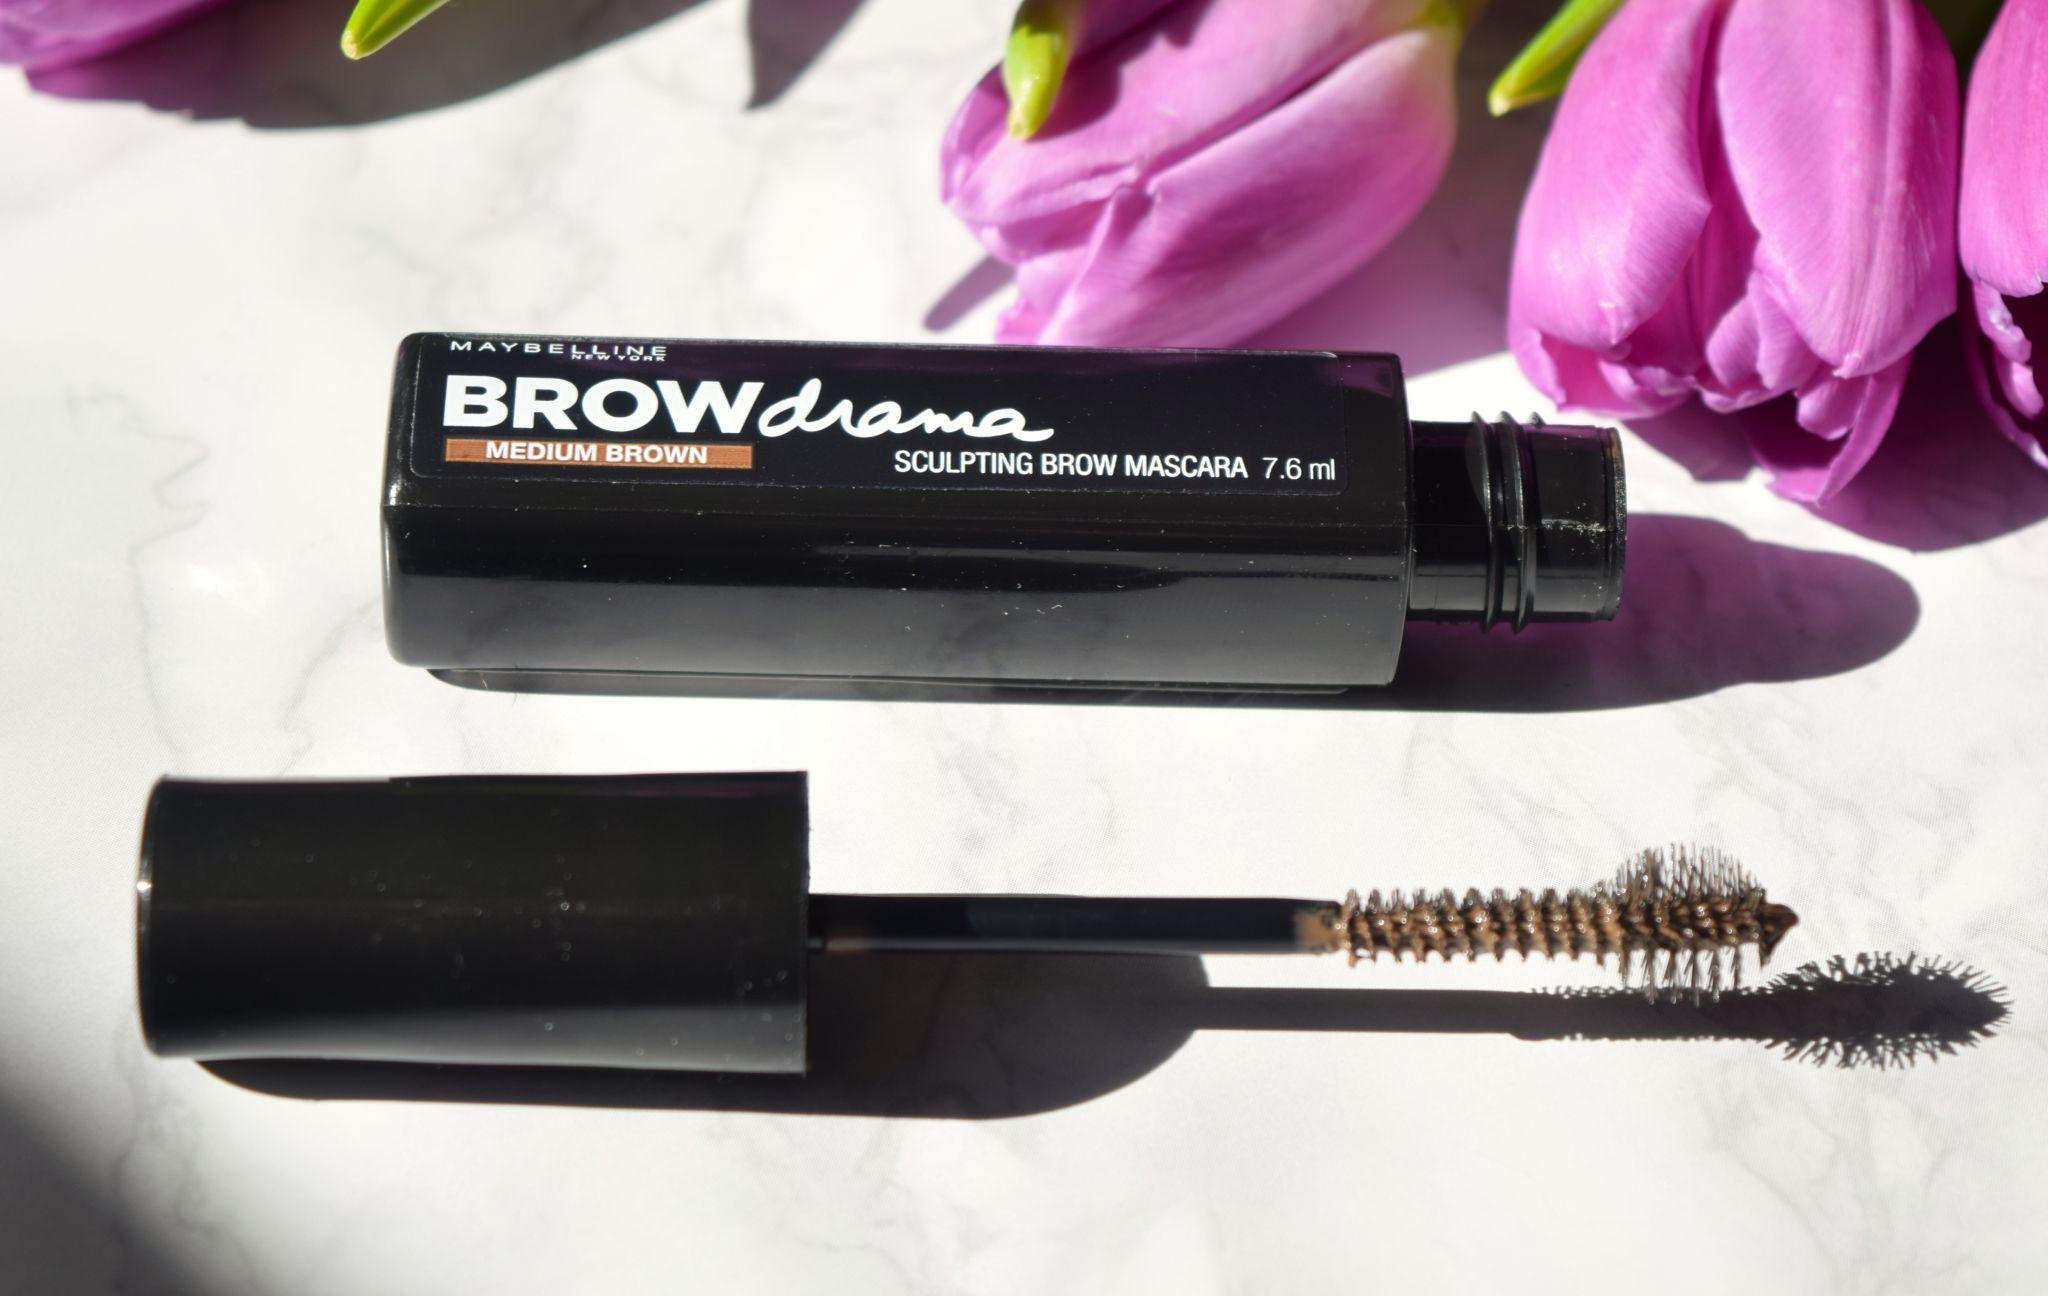 Maybelline Brow Drama Brow Mascara 1